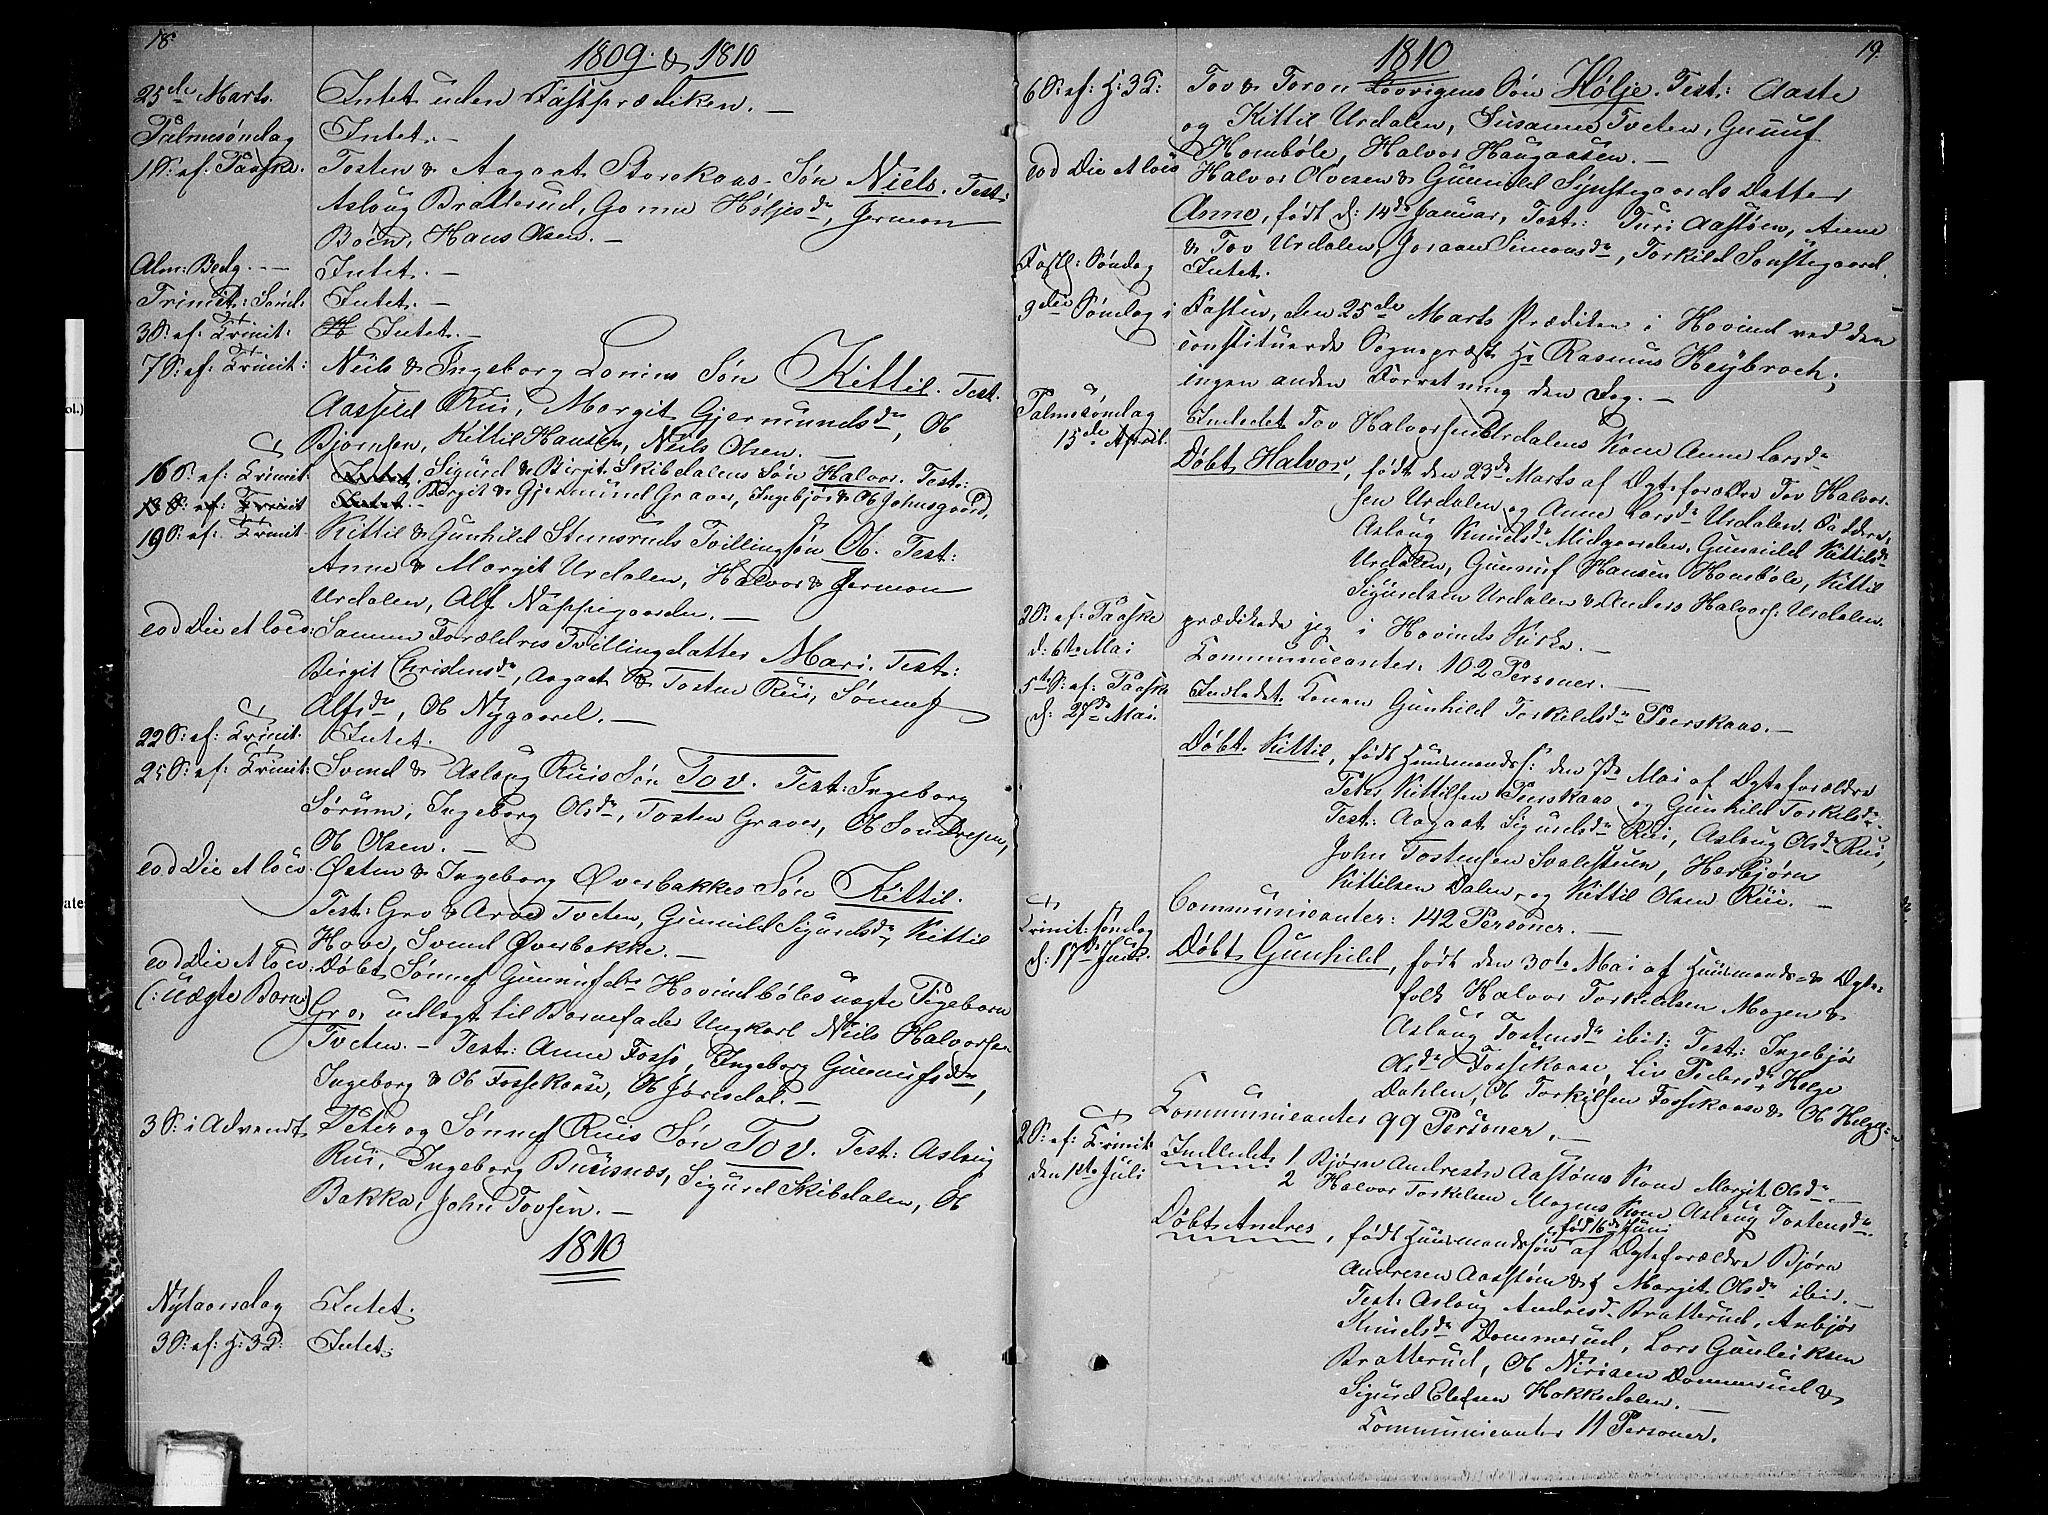 SAKO, Gransherad kirkebøker, F/Fb/L0001: Ministerialbok nr. II 1, 1800-1814, s. 18-19